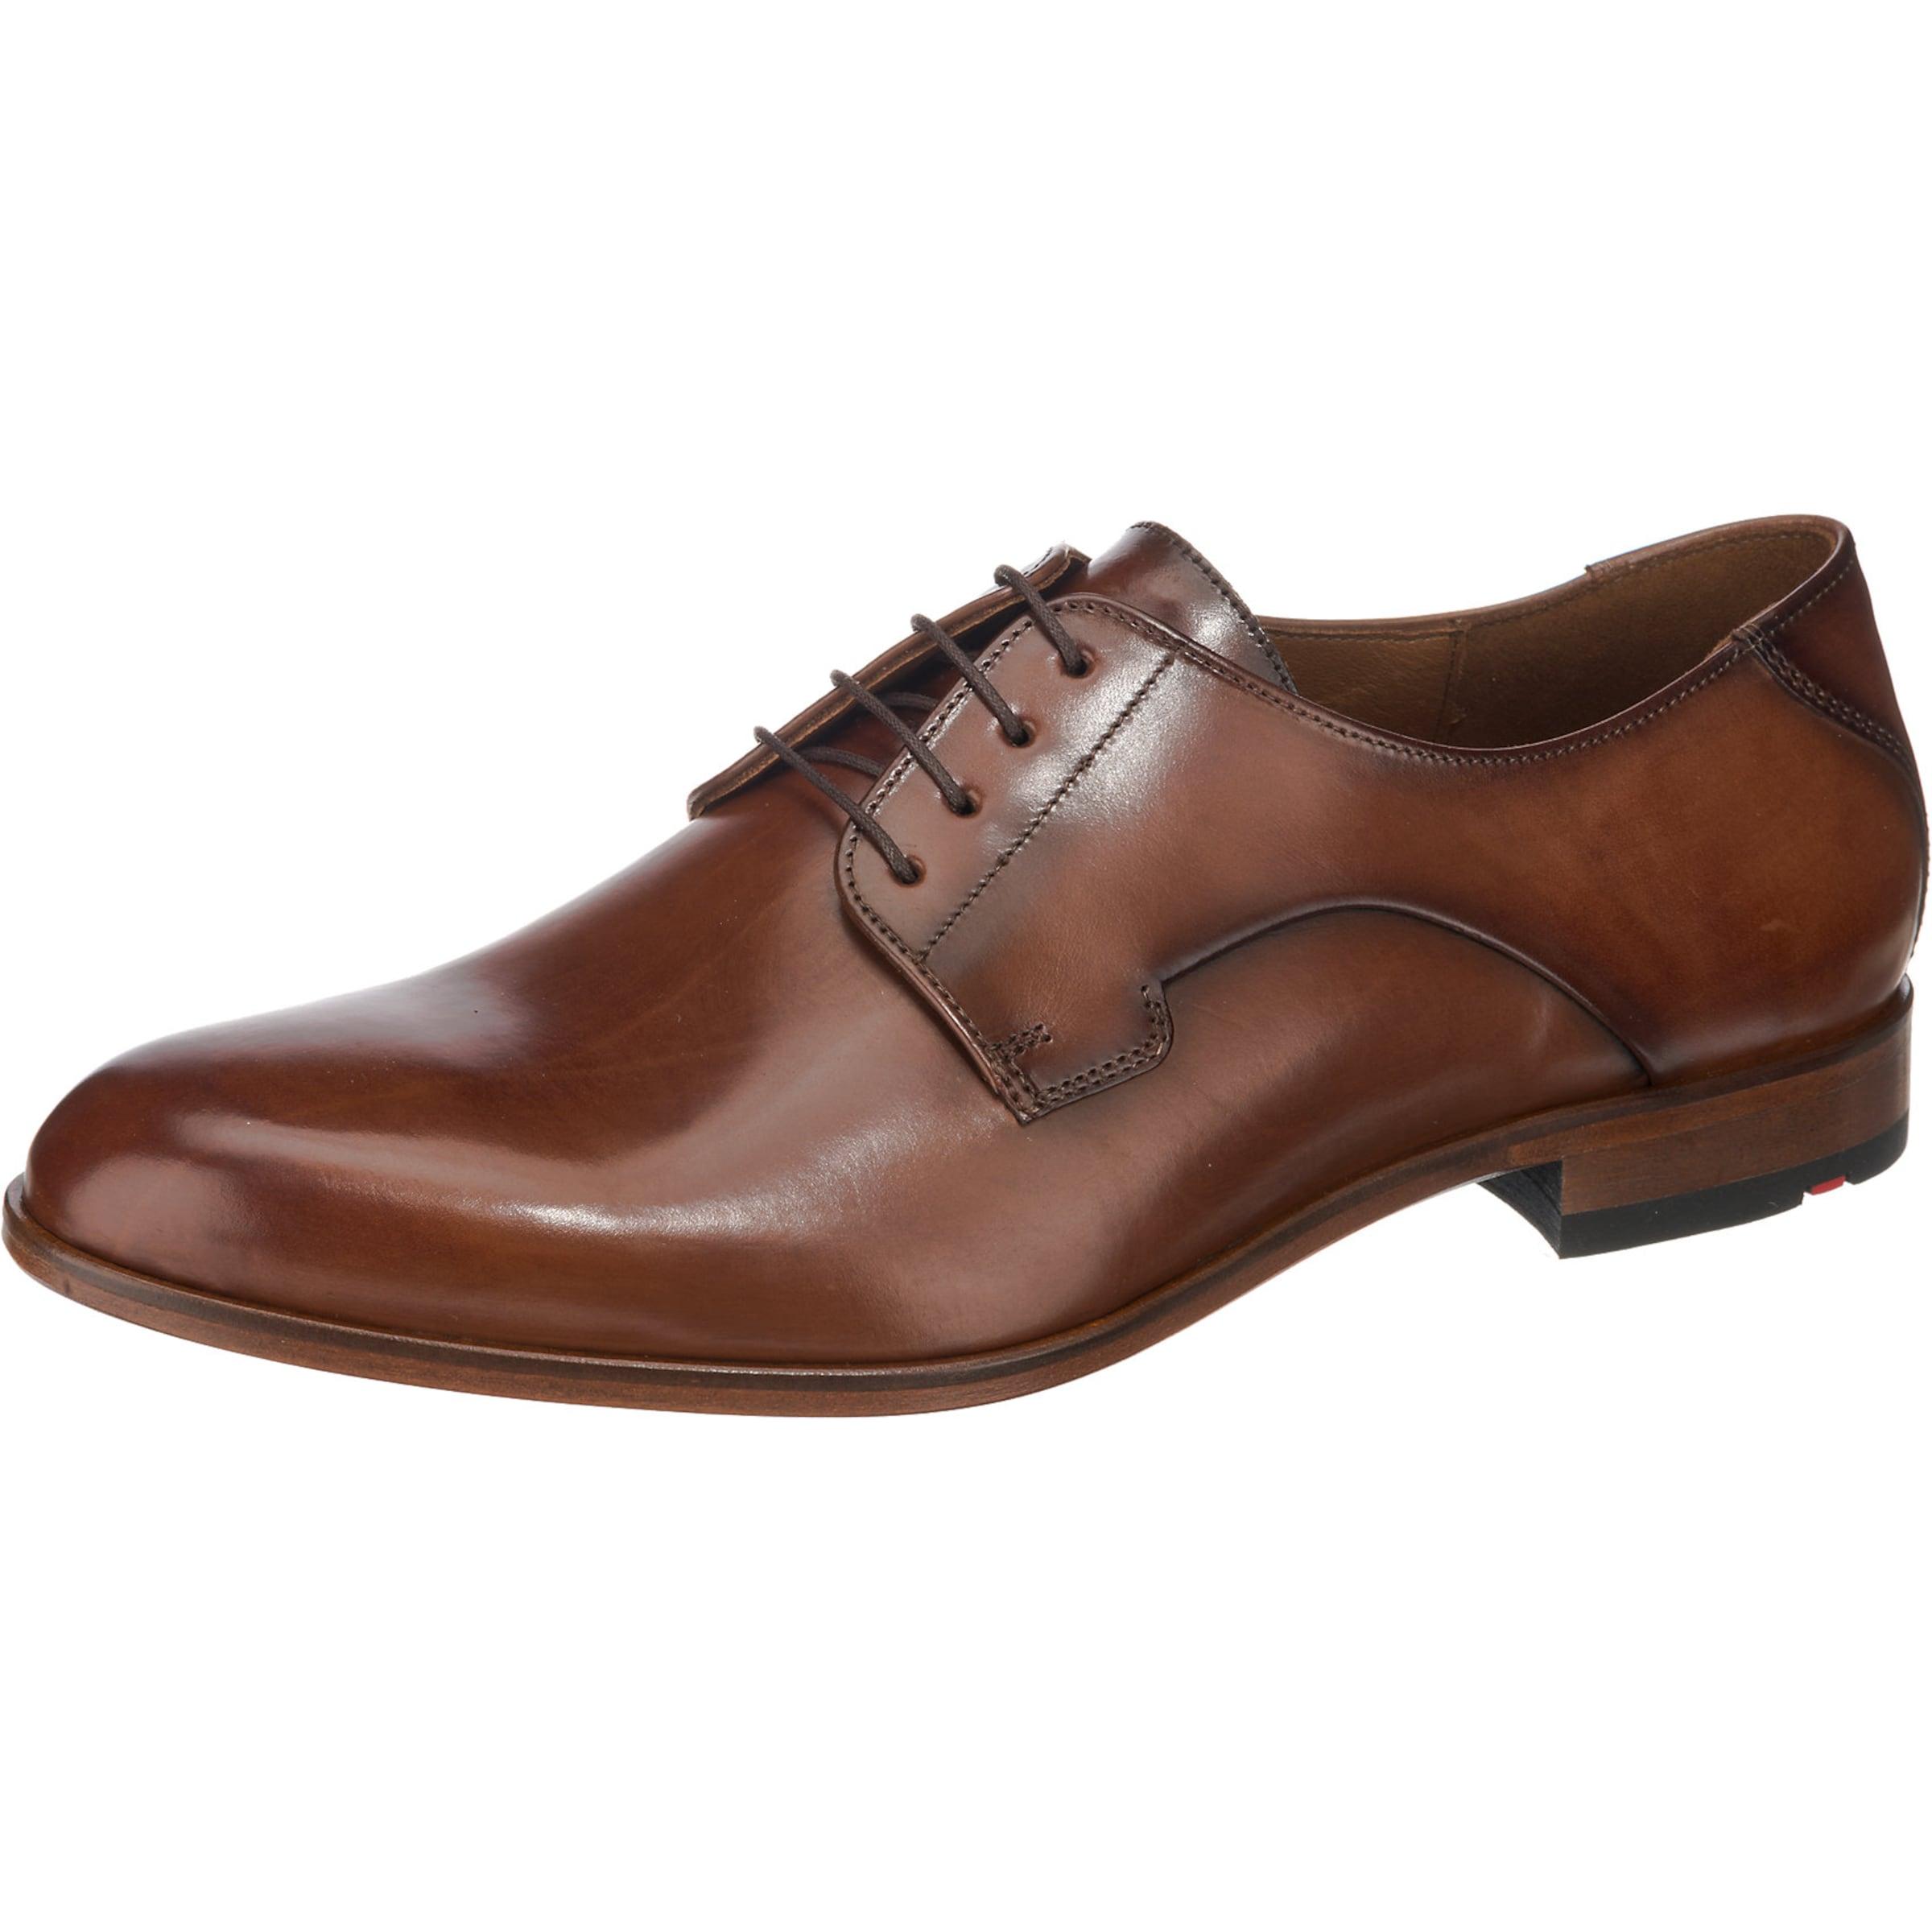 Haltbare Mode billige Schuhe LLOYD   MANNEX Business-Schnürschuhe Schuhe Gut getragene Schuhe